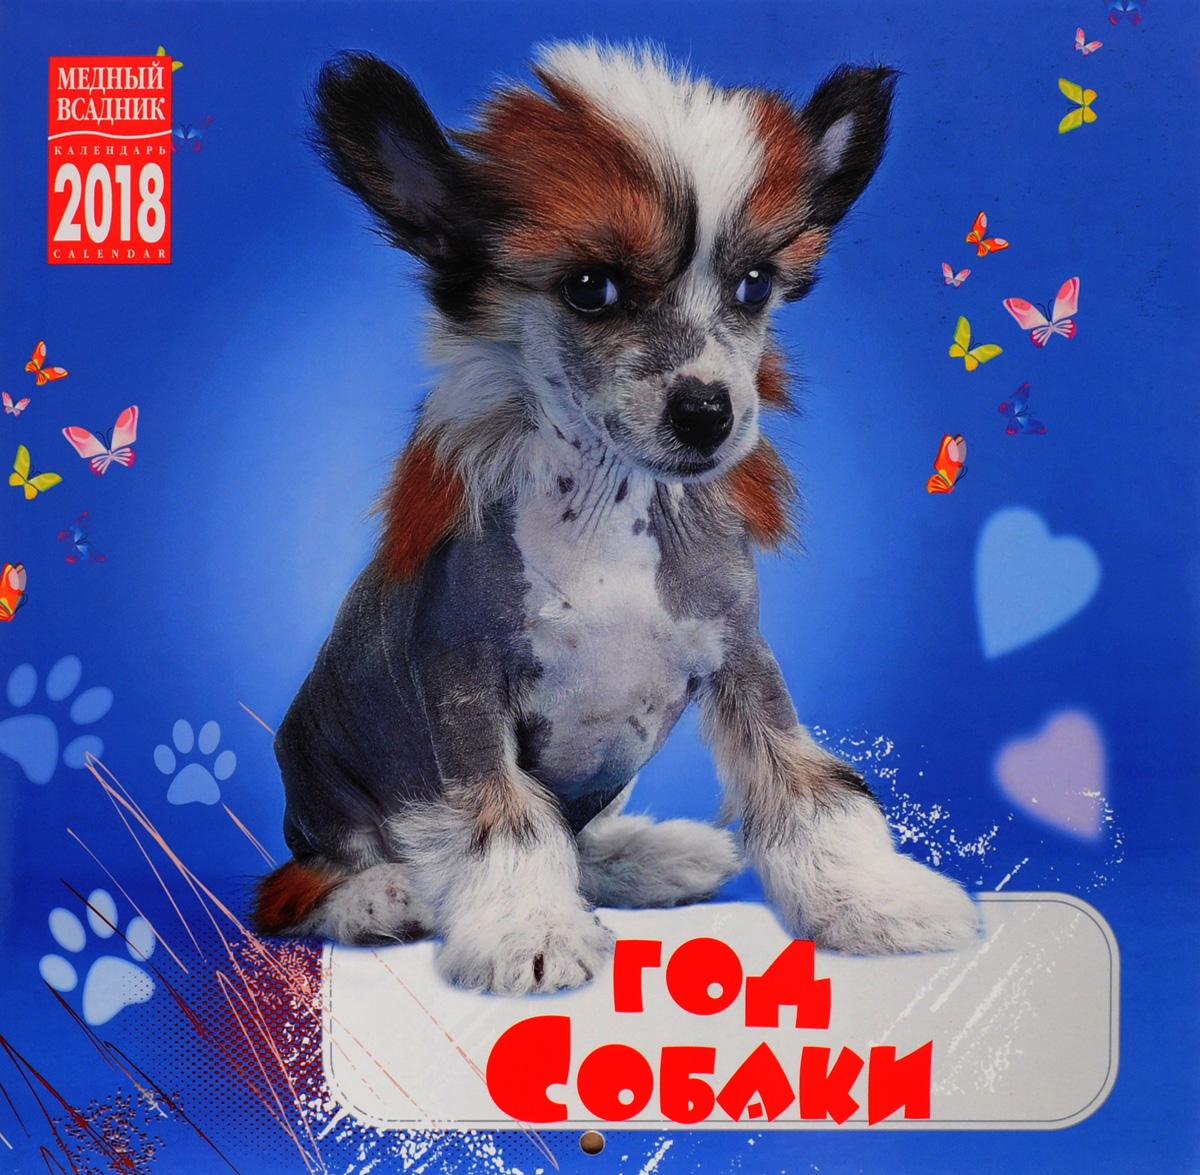 Календарь 2018 год (на скрепке). Год Собаки